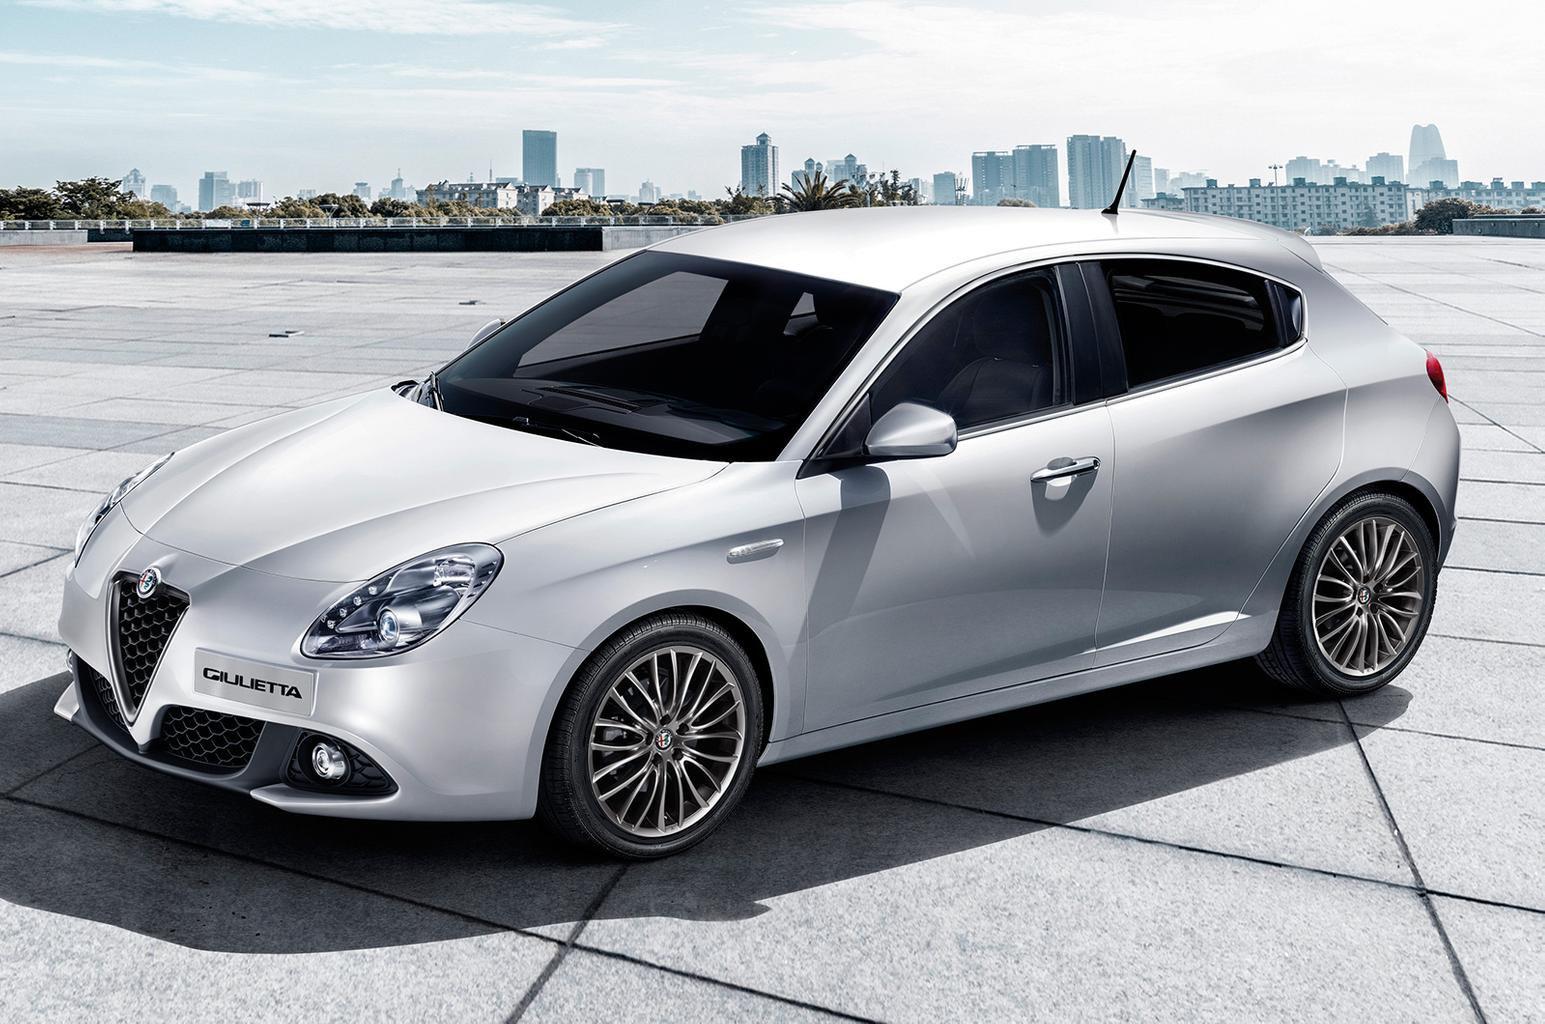 2016 Alfa Romeo Giulietta facelift revealed